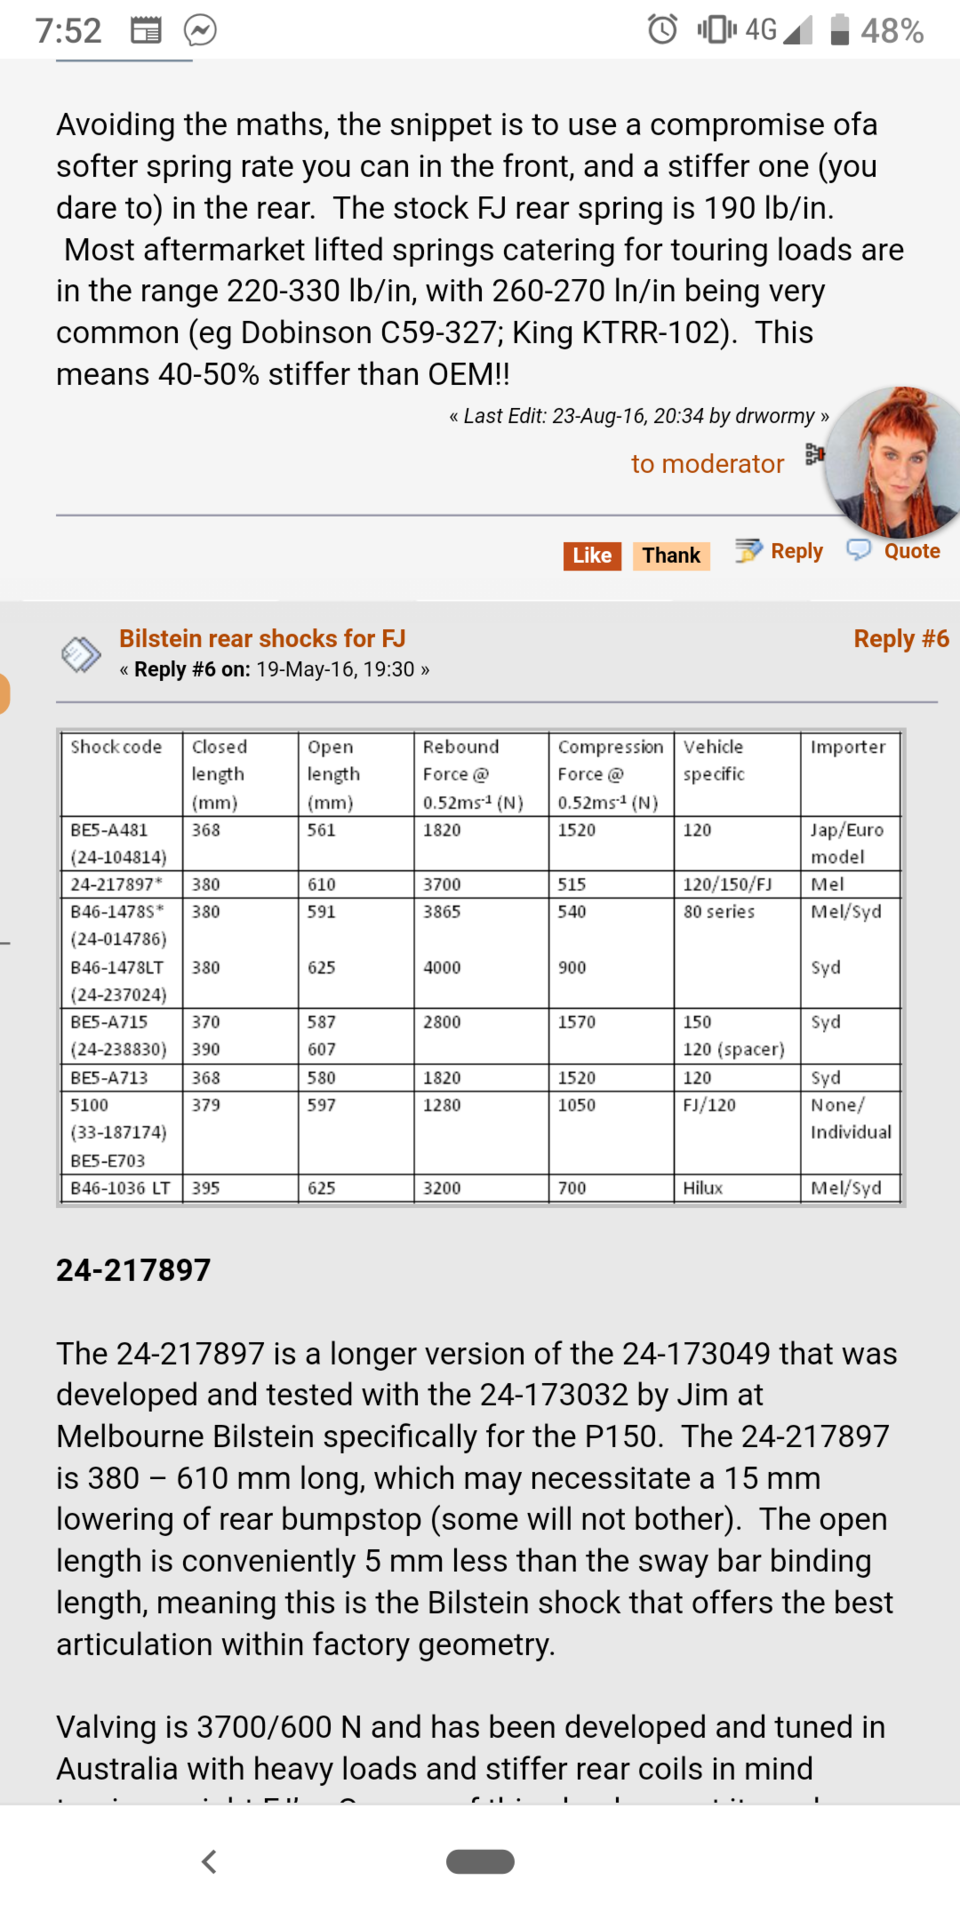 Screenshot_20190709-075244.png